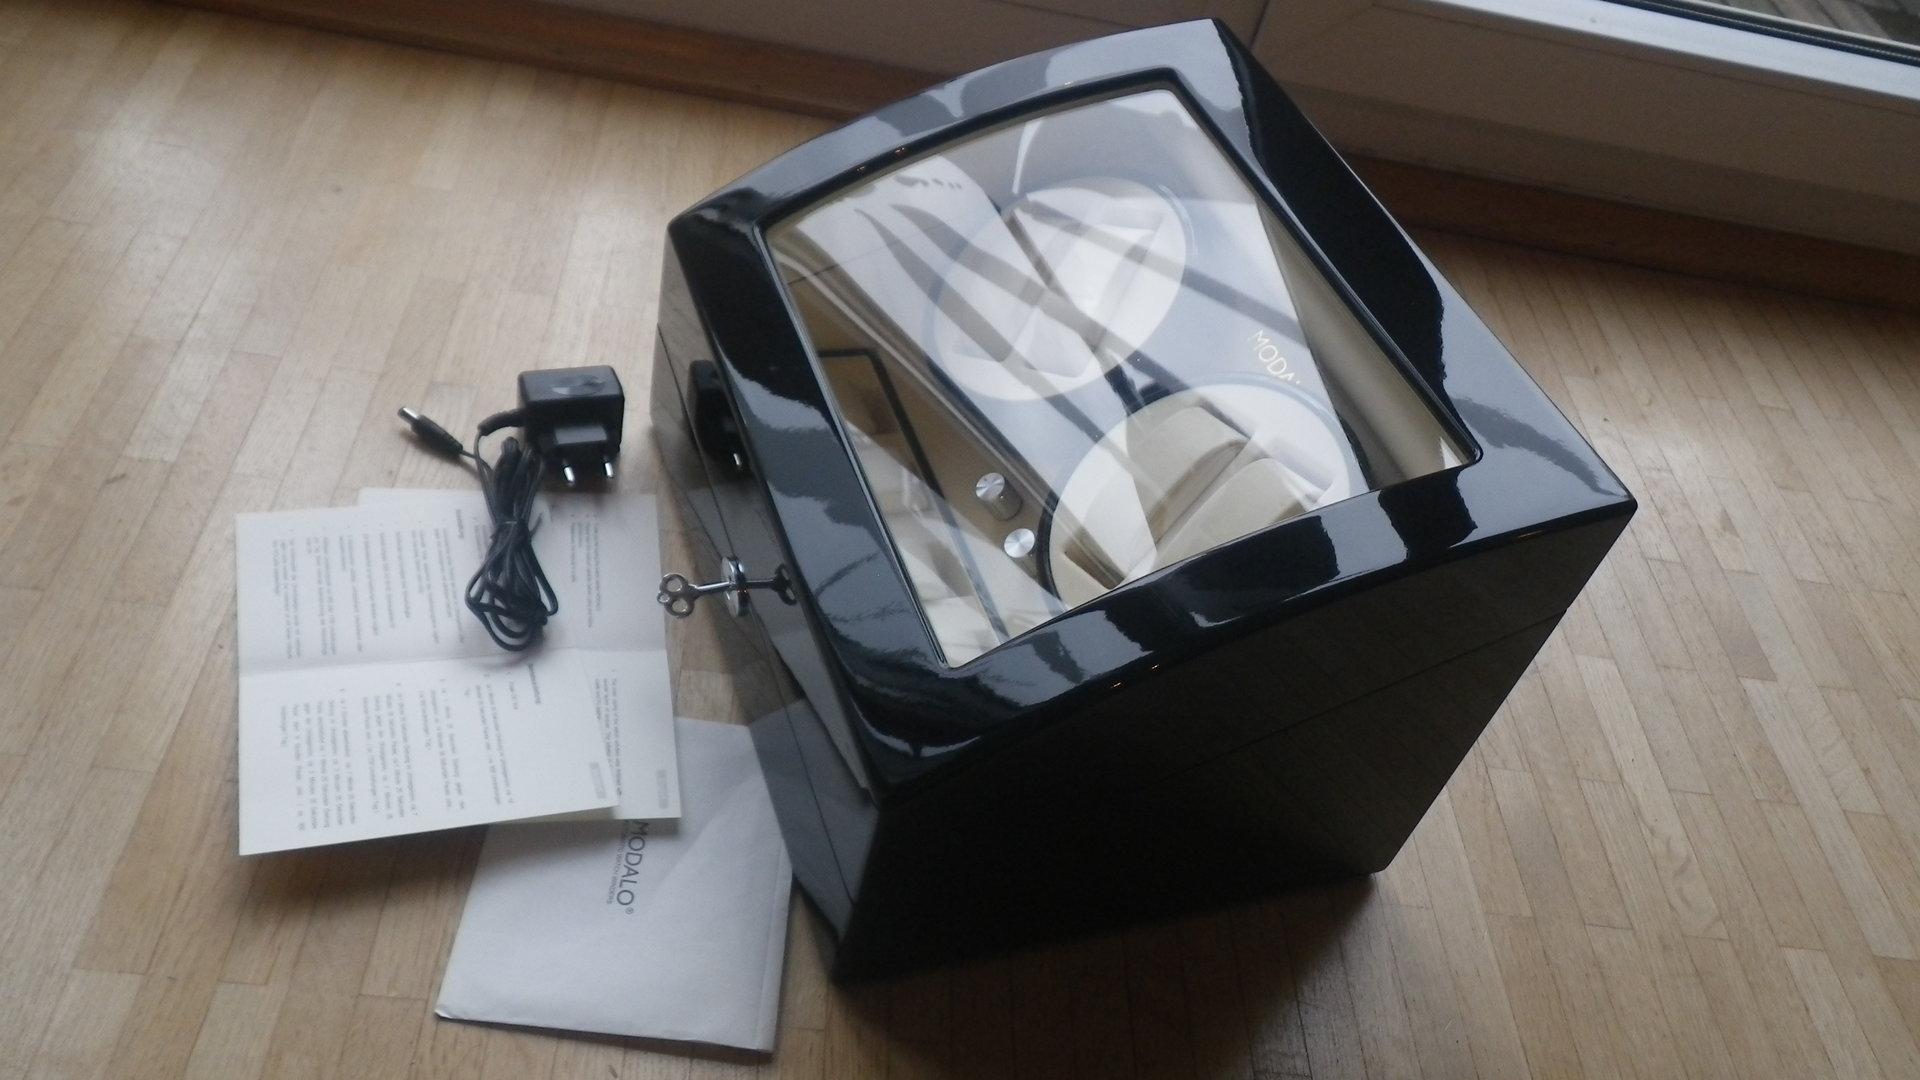 erledigt uhrenbeweger modalo f r 4 uhren schwarz klavierlack uhrforum. Black Bedroom Furniture Sets. Home Design Ideas